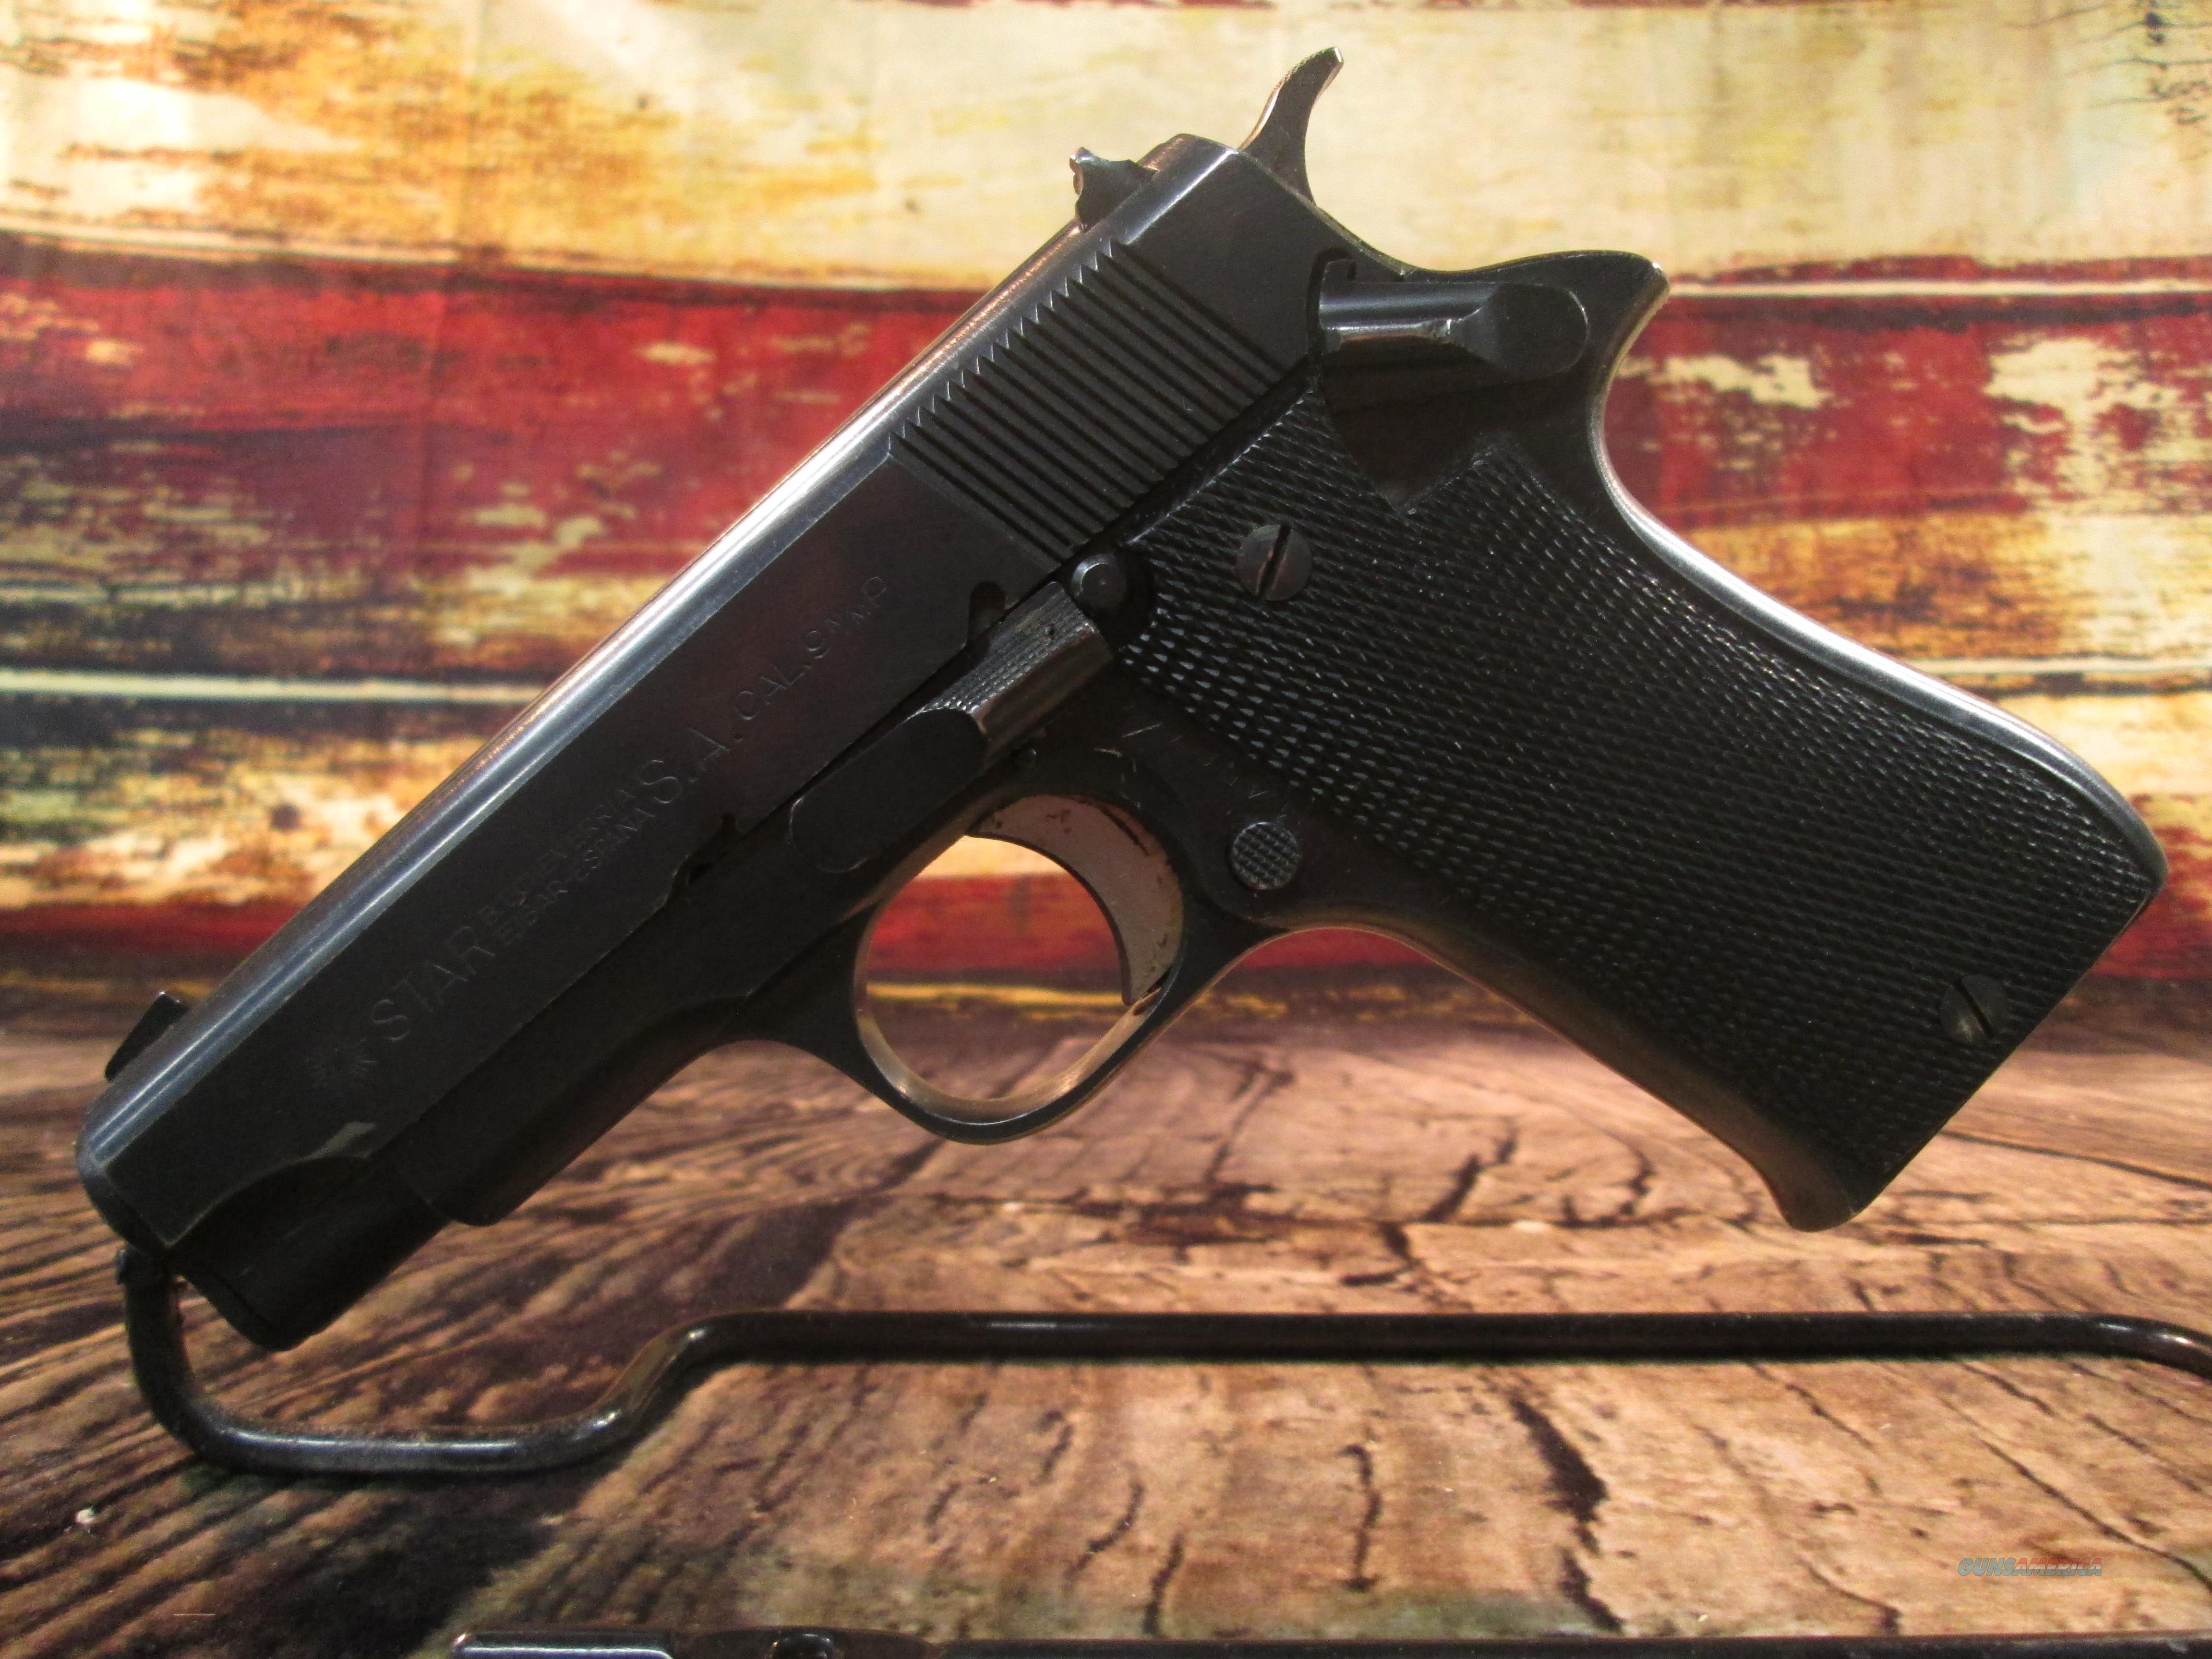 CENTURY ARMS STAR BM 9MM New (HG3764-V)  Guns > Pistols > Star Pistols